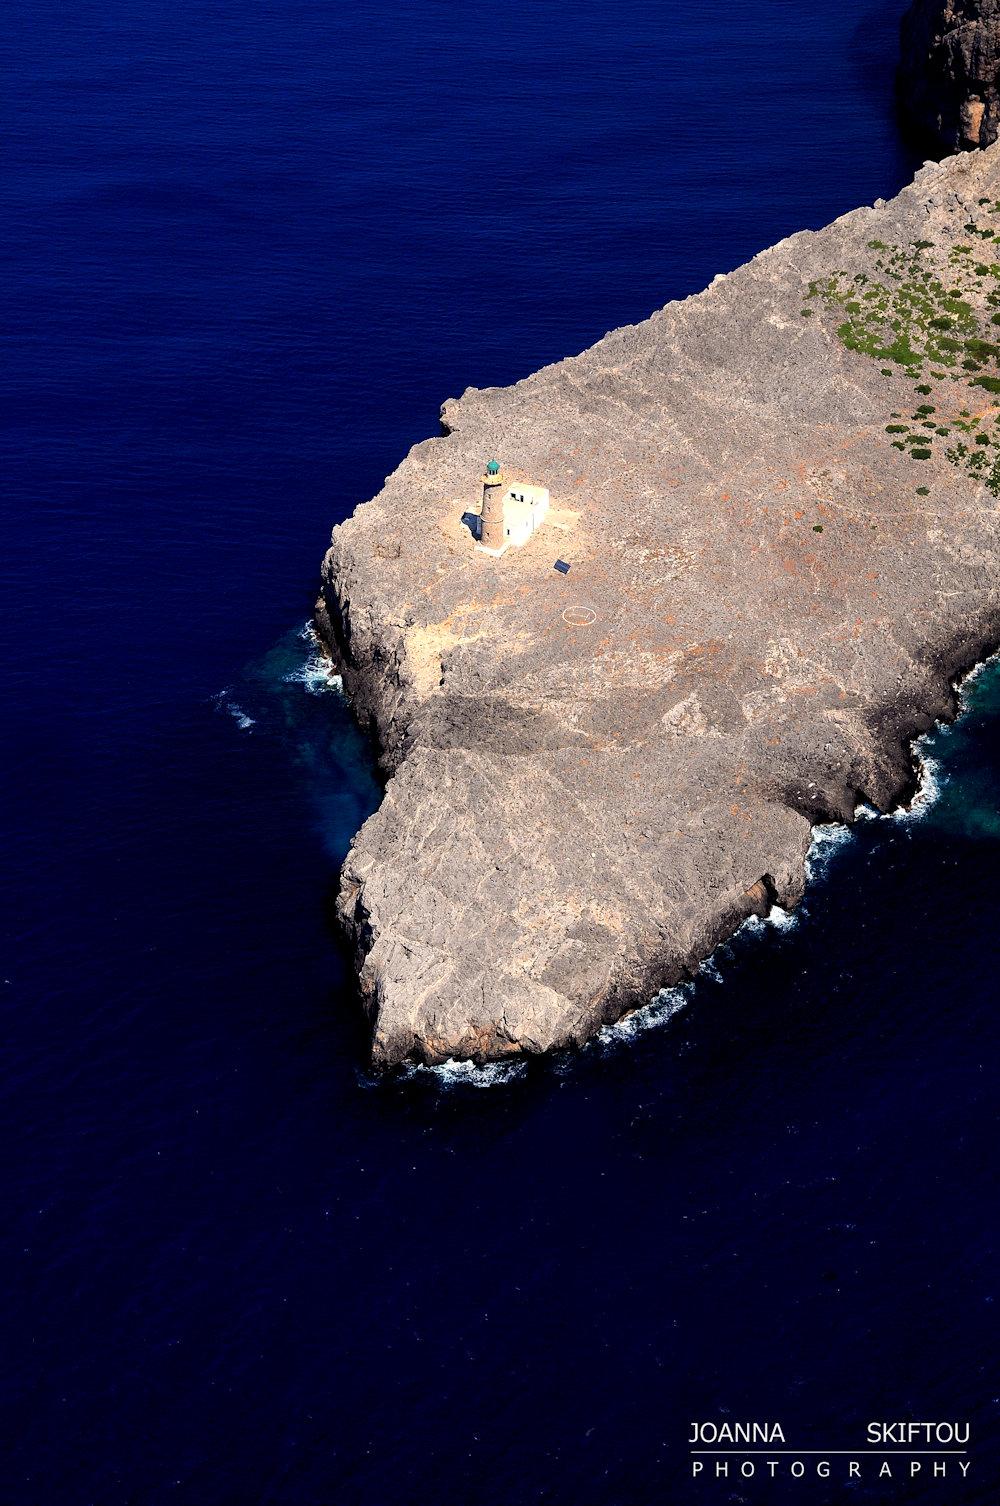 Aerial photography by Joanna Skiftou, Antikithira, Greece